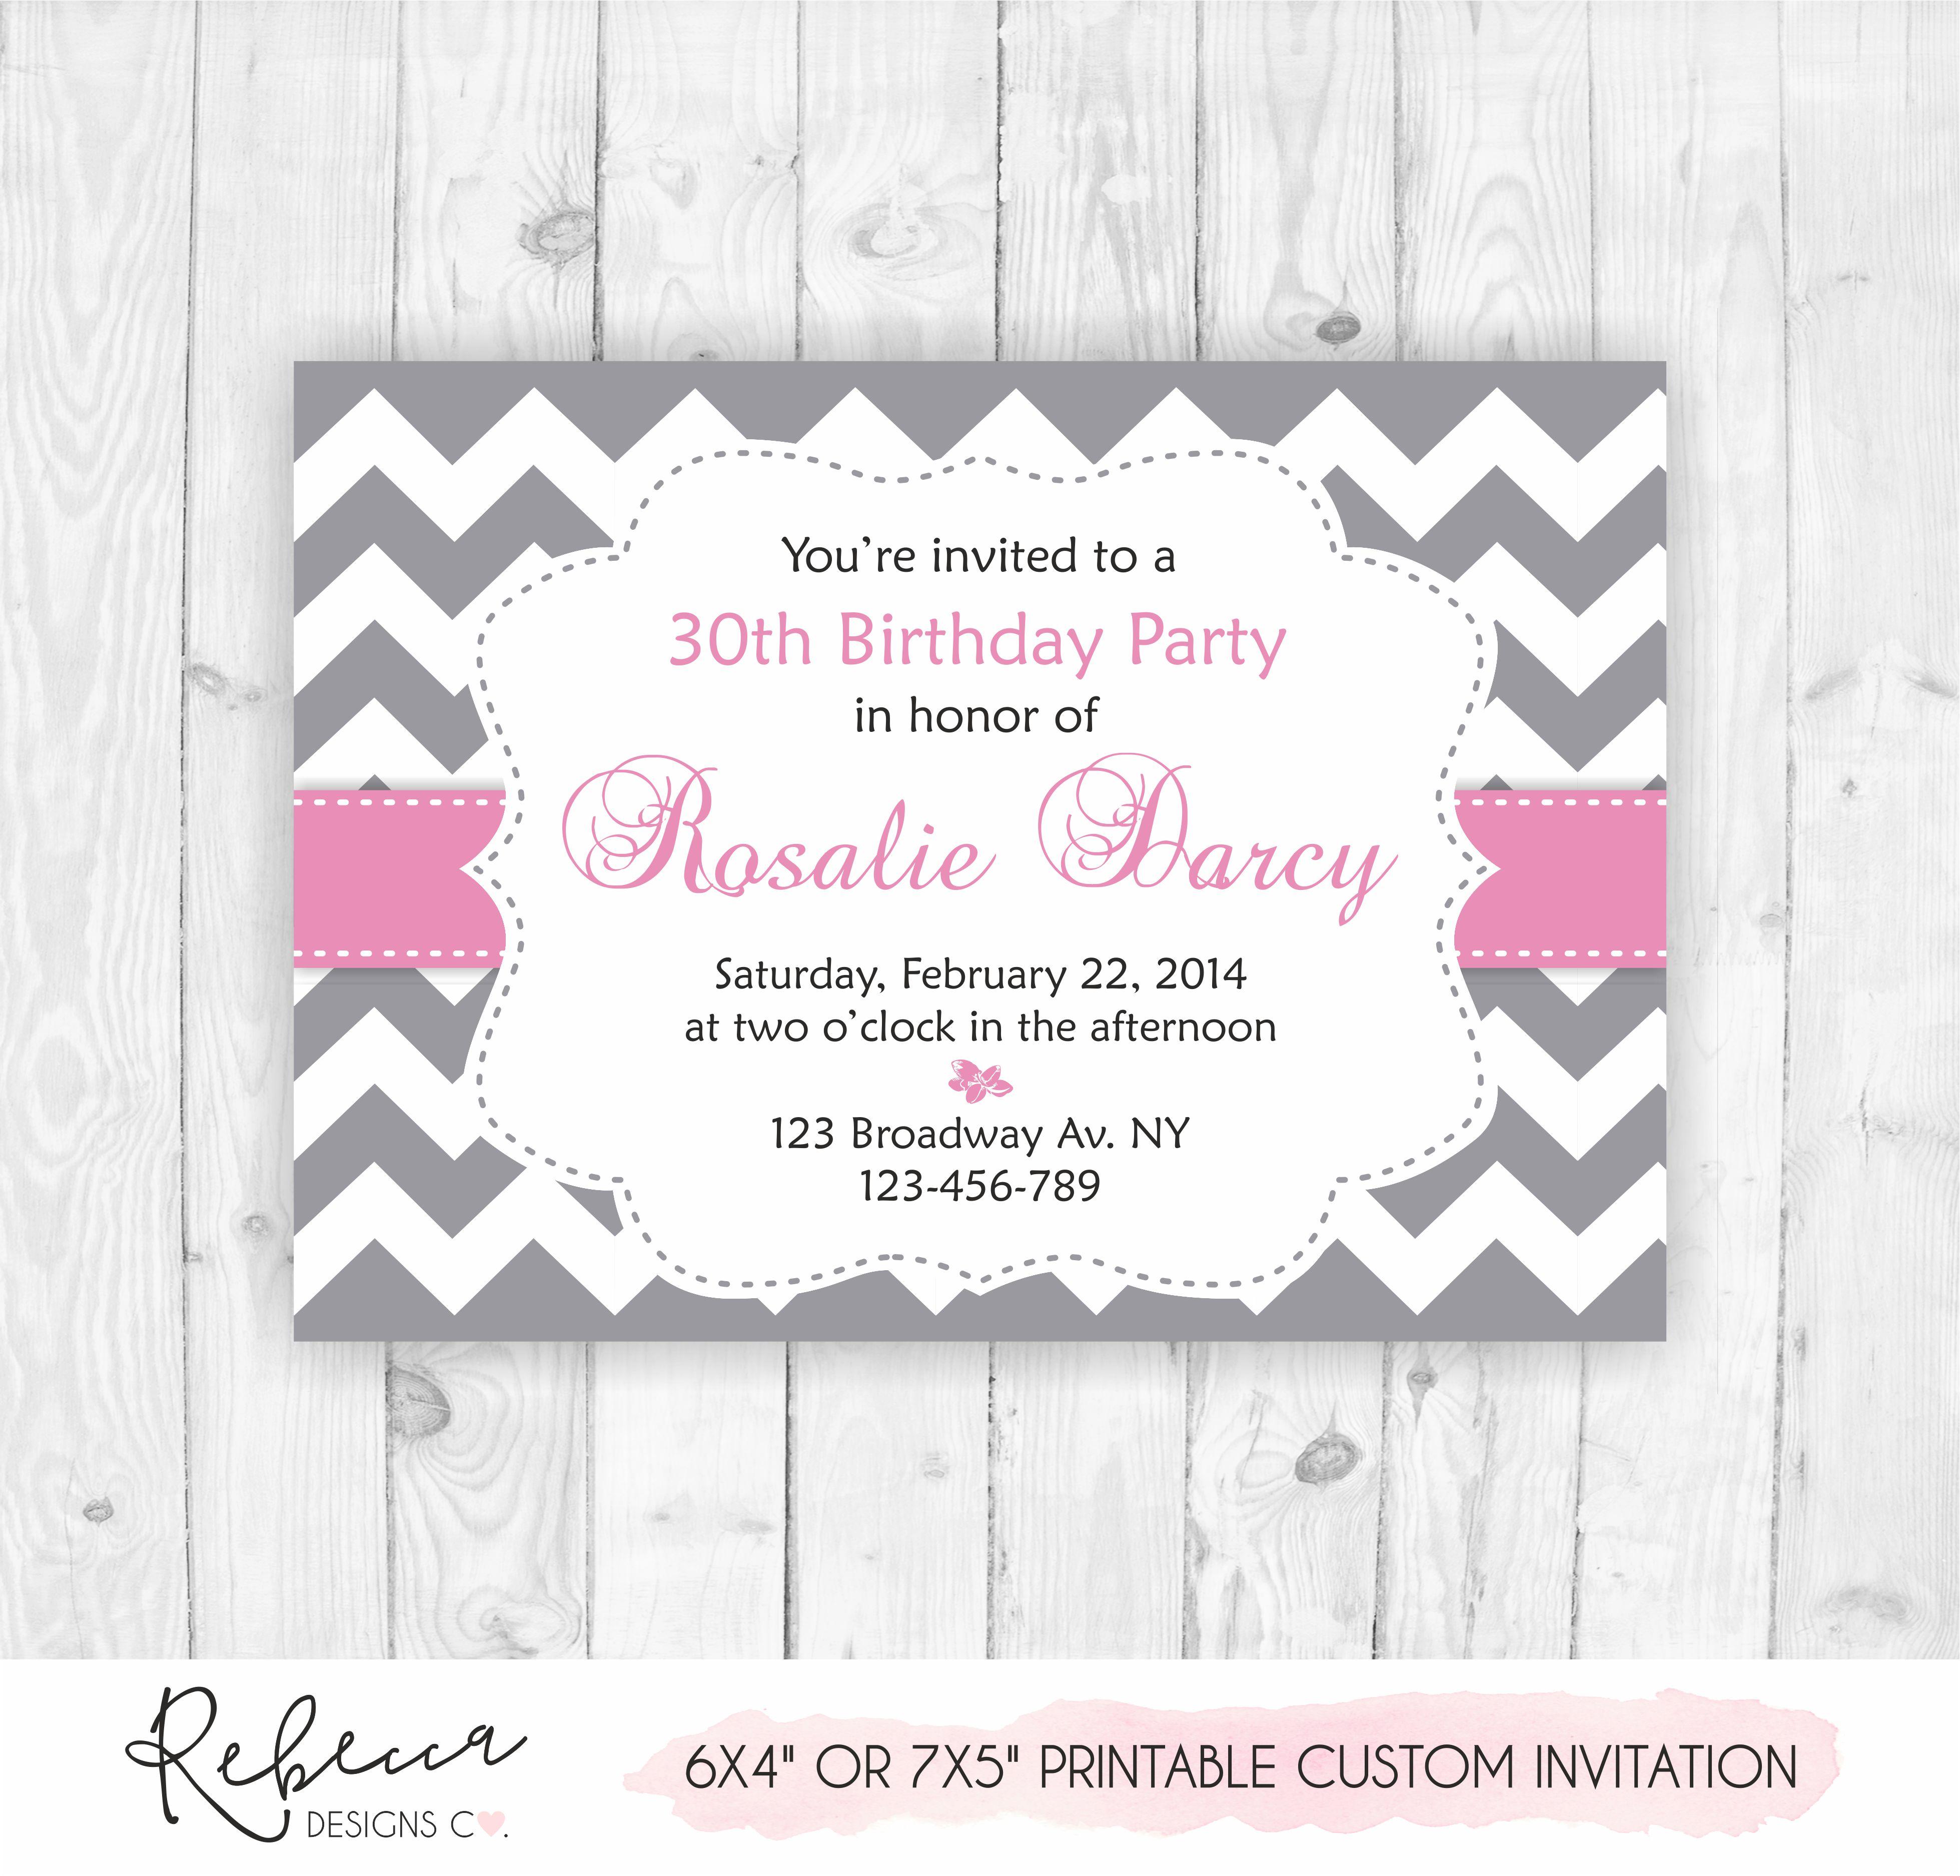 Gray And Pink Birthdau Invitation O Printable Custom Design